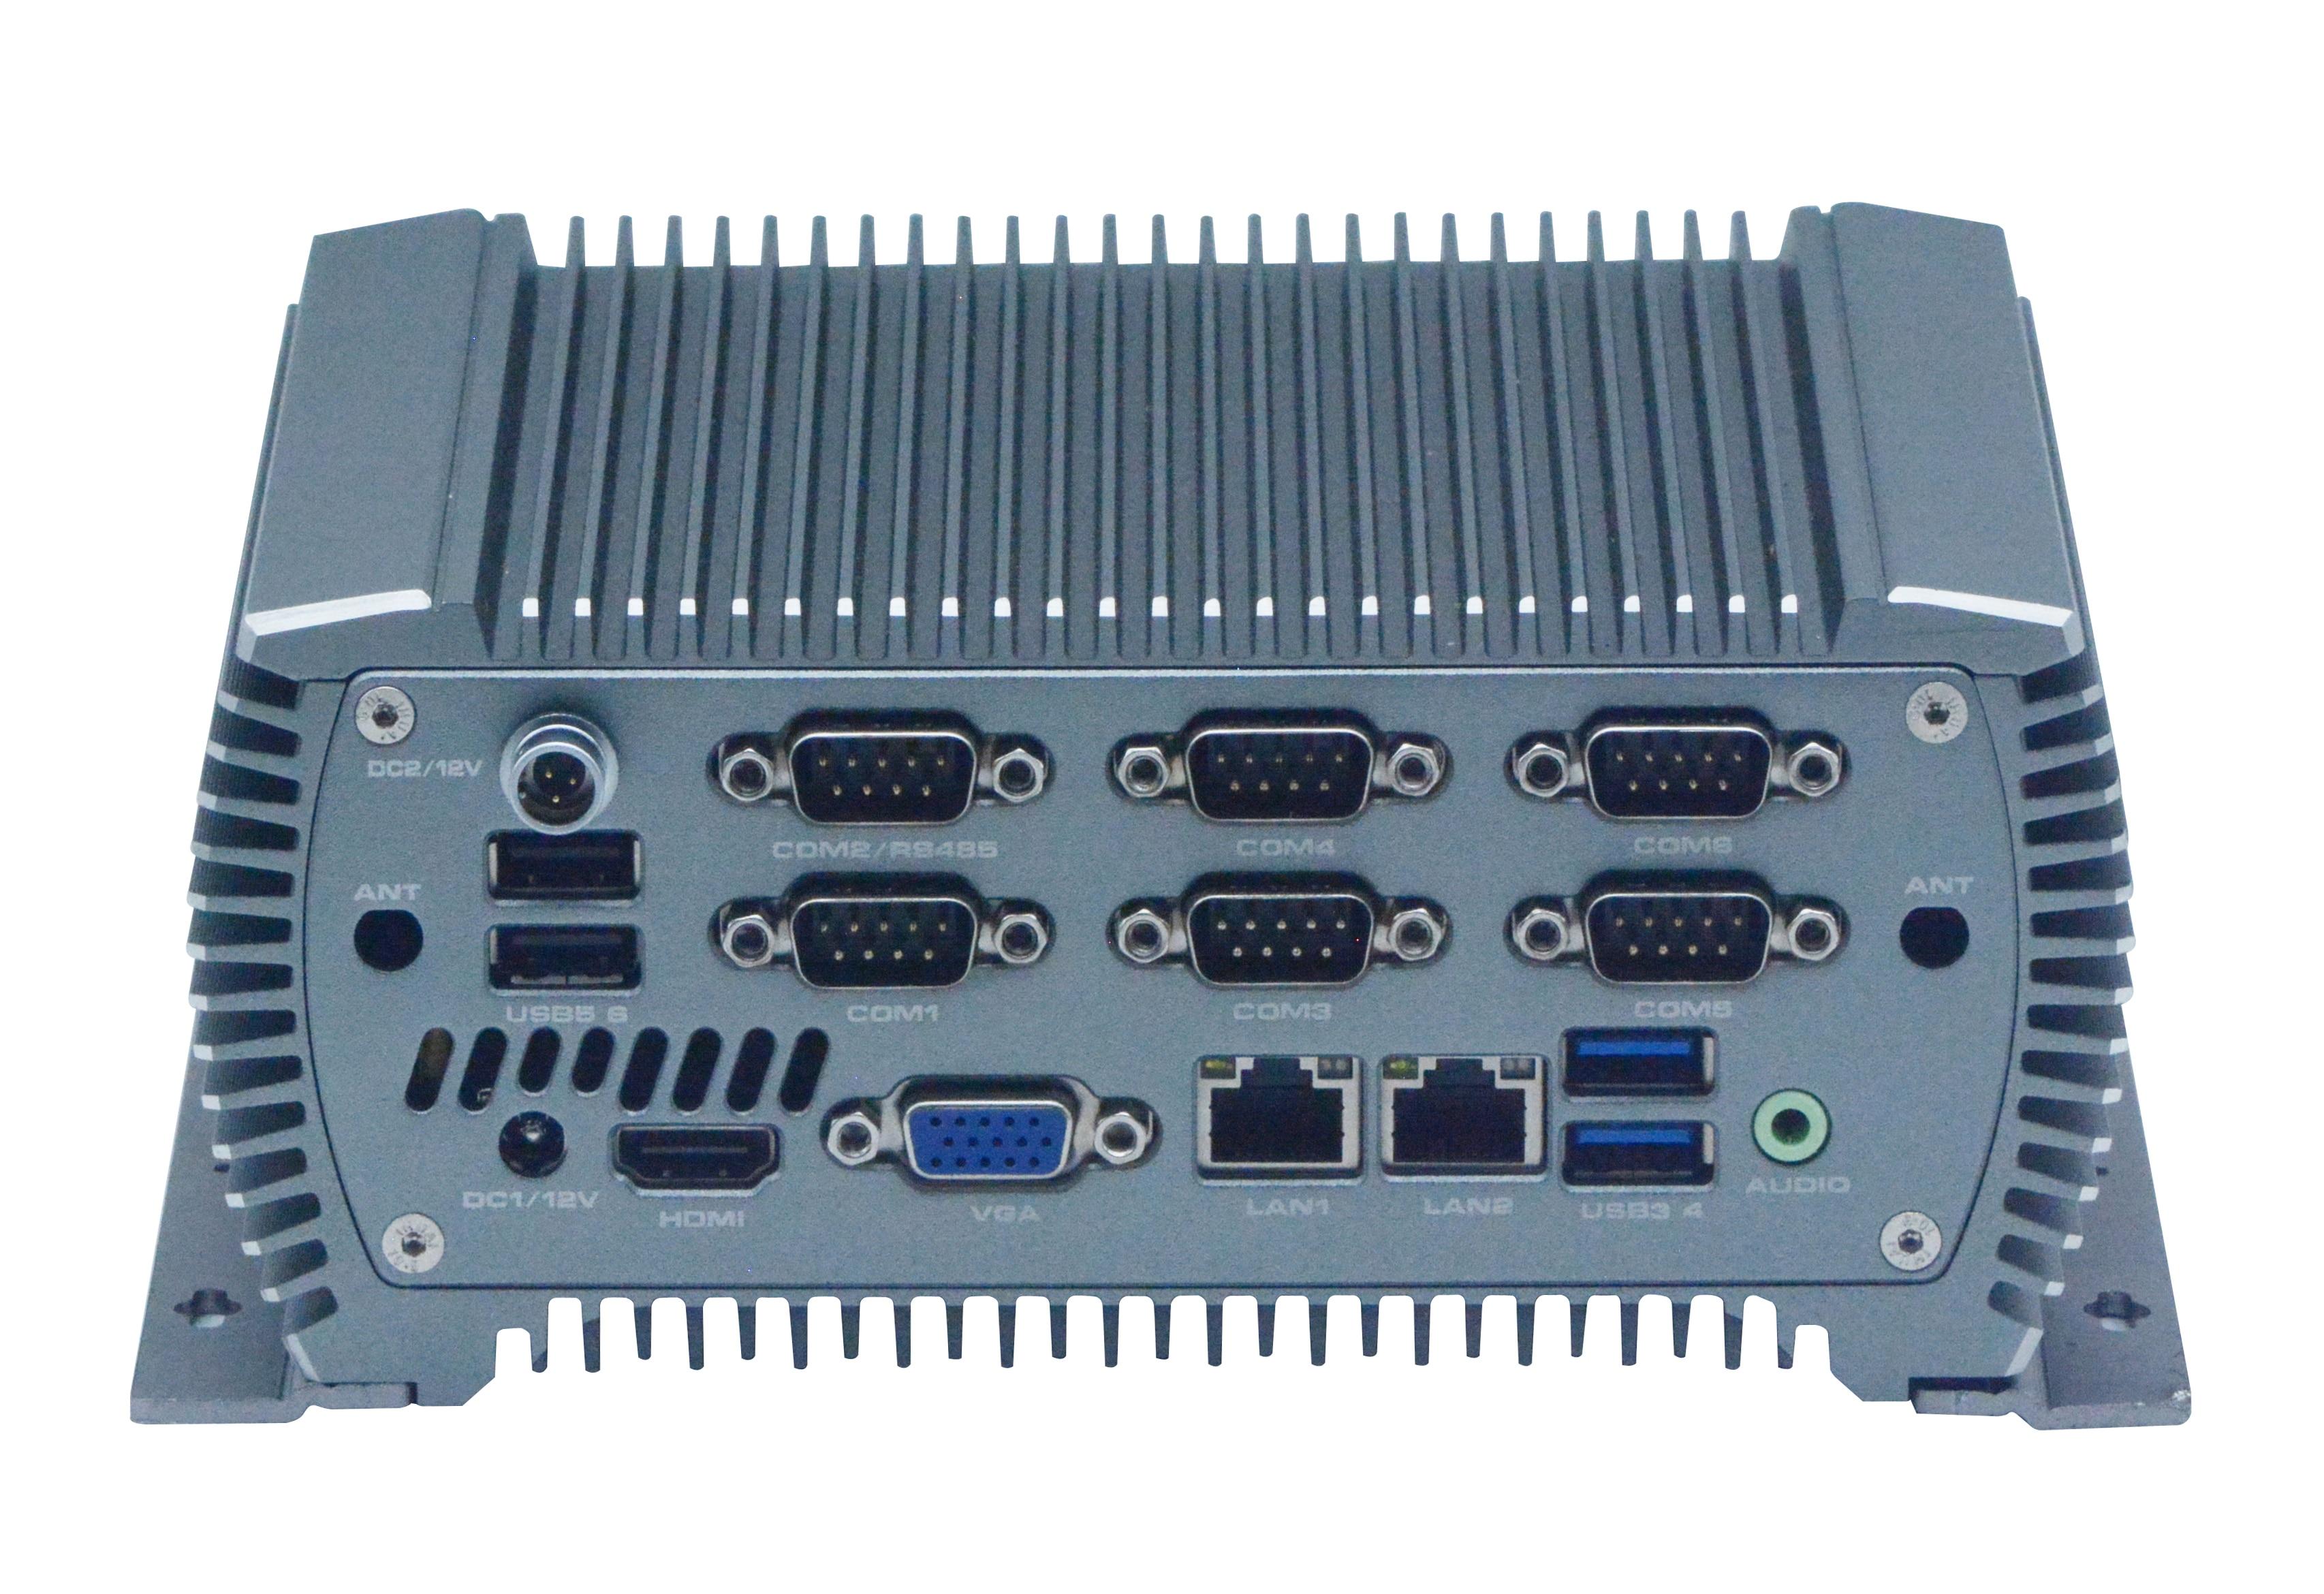 Mini Pc Industrial Fanless Computer I5-6360U 2*LAN 6*USB 6*COM HDMI  GPIO Windows Linux Nettop Fanless Industrial Mini Computer